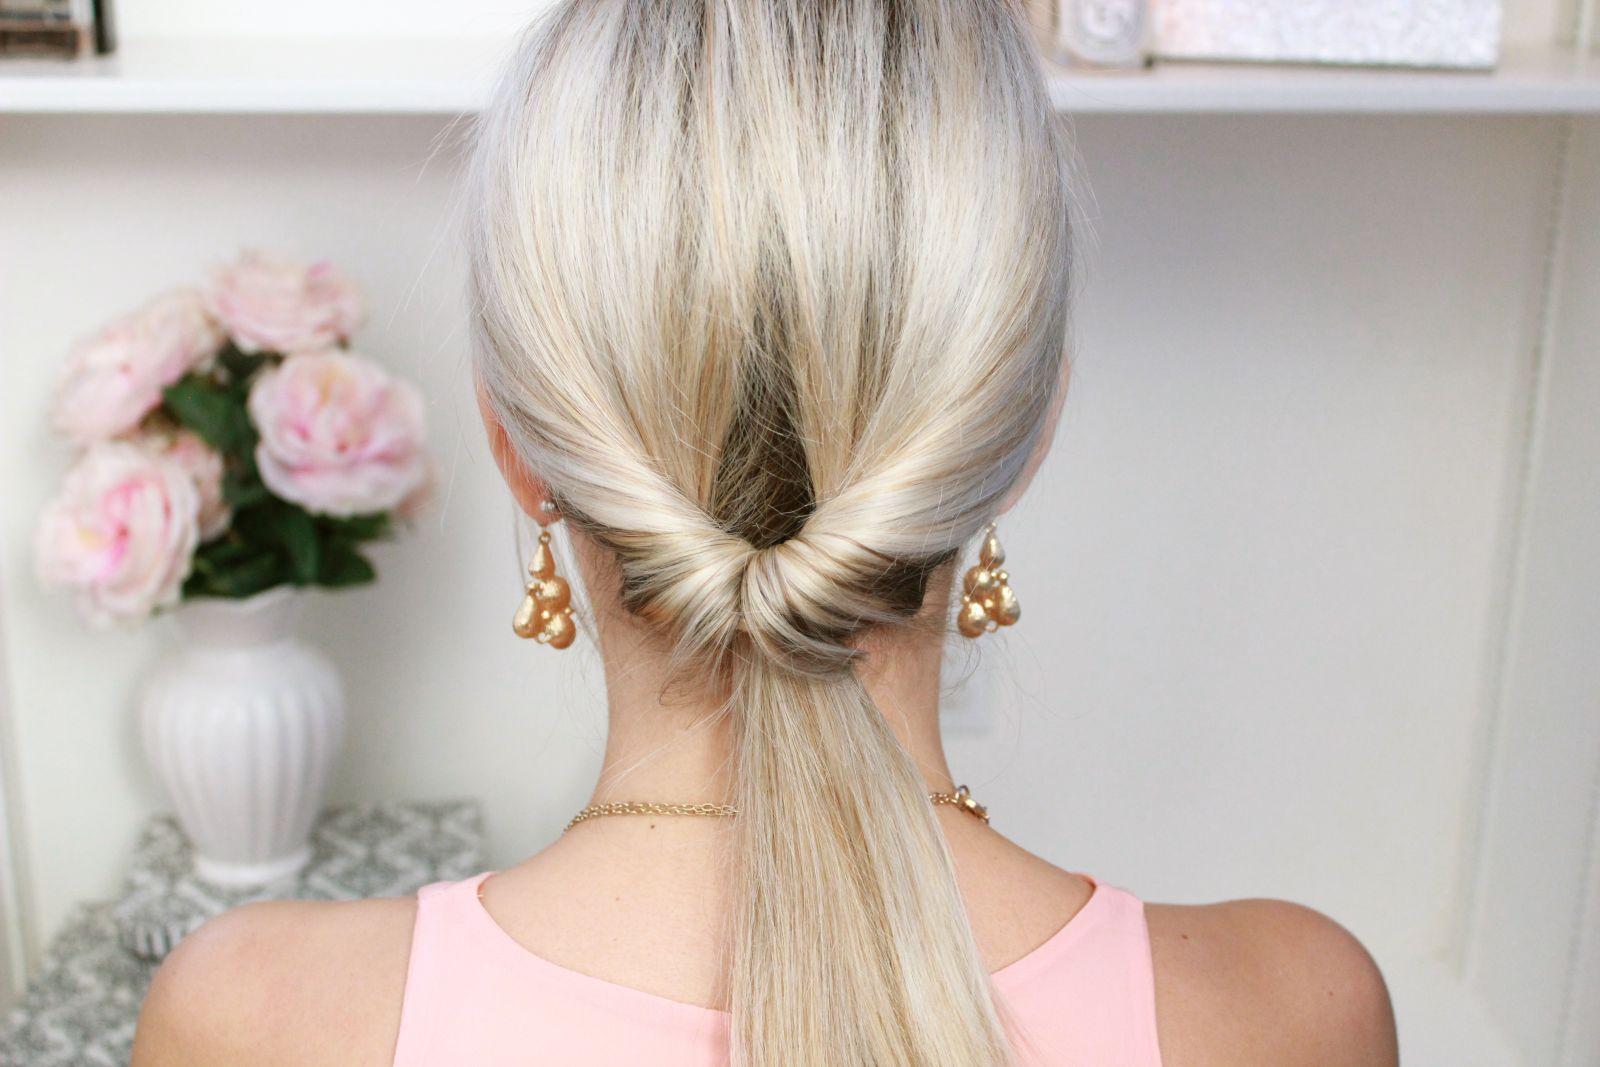 Hair tips - Looped Ponytail